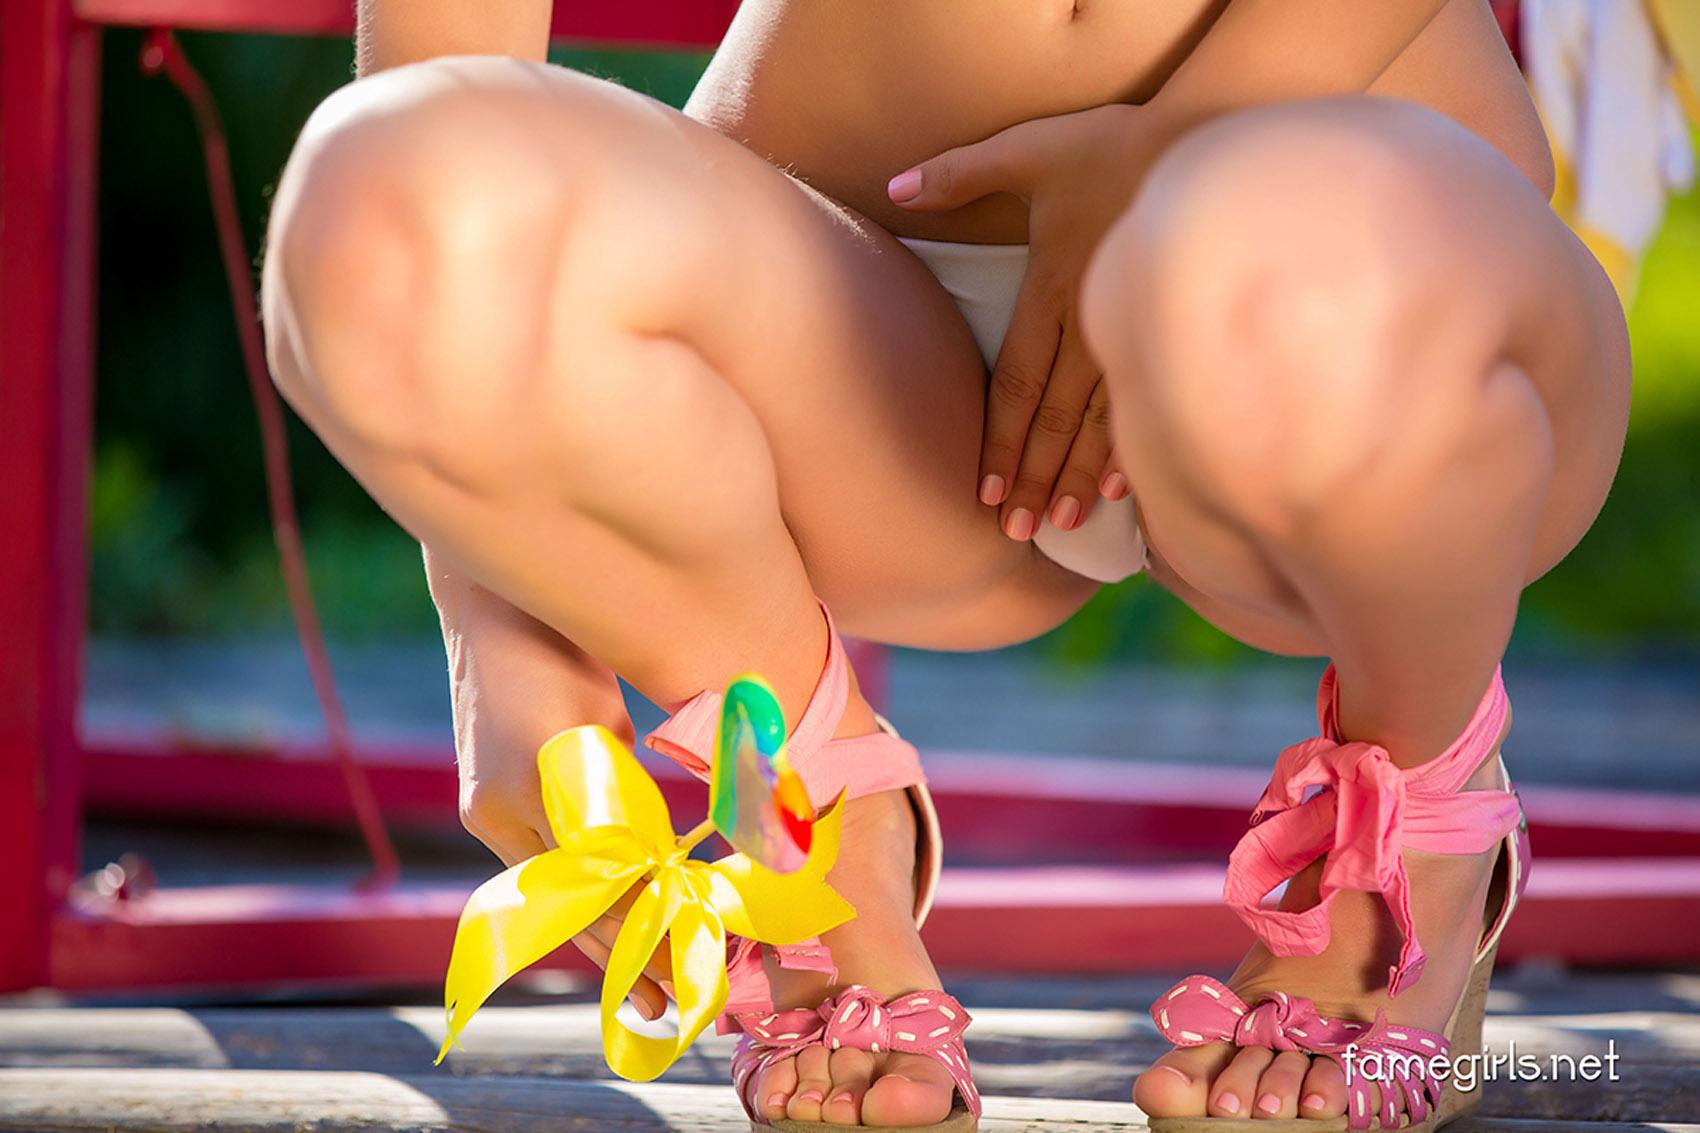 porn videos tiffany thiessen nude mega old porn teri copley naked